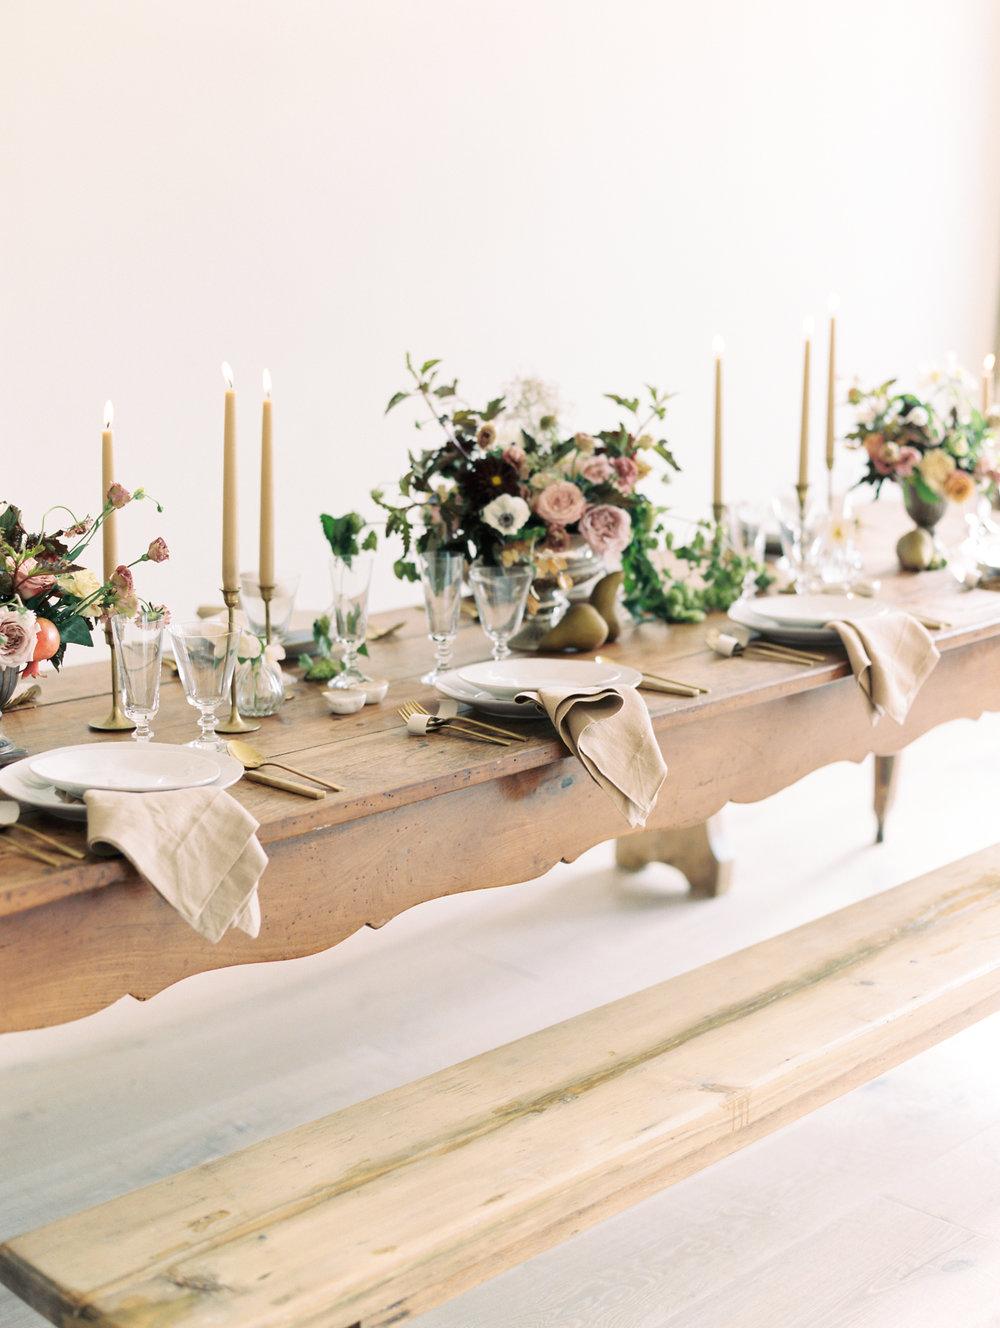 Elegant Provençal Elopement  |  Featured on Style Me Pretty   Rancho Santa Fe, CA